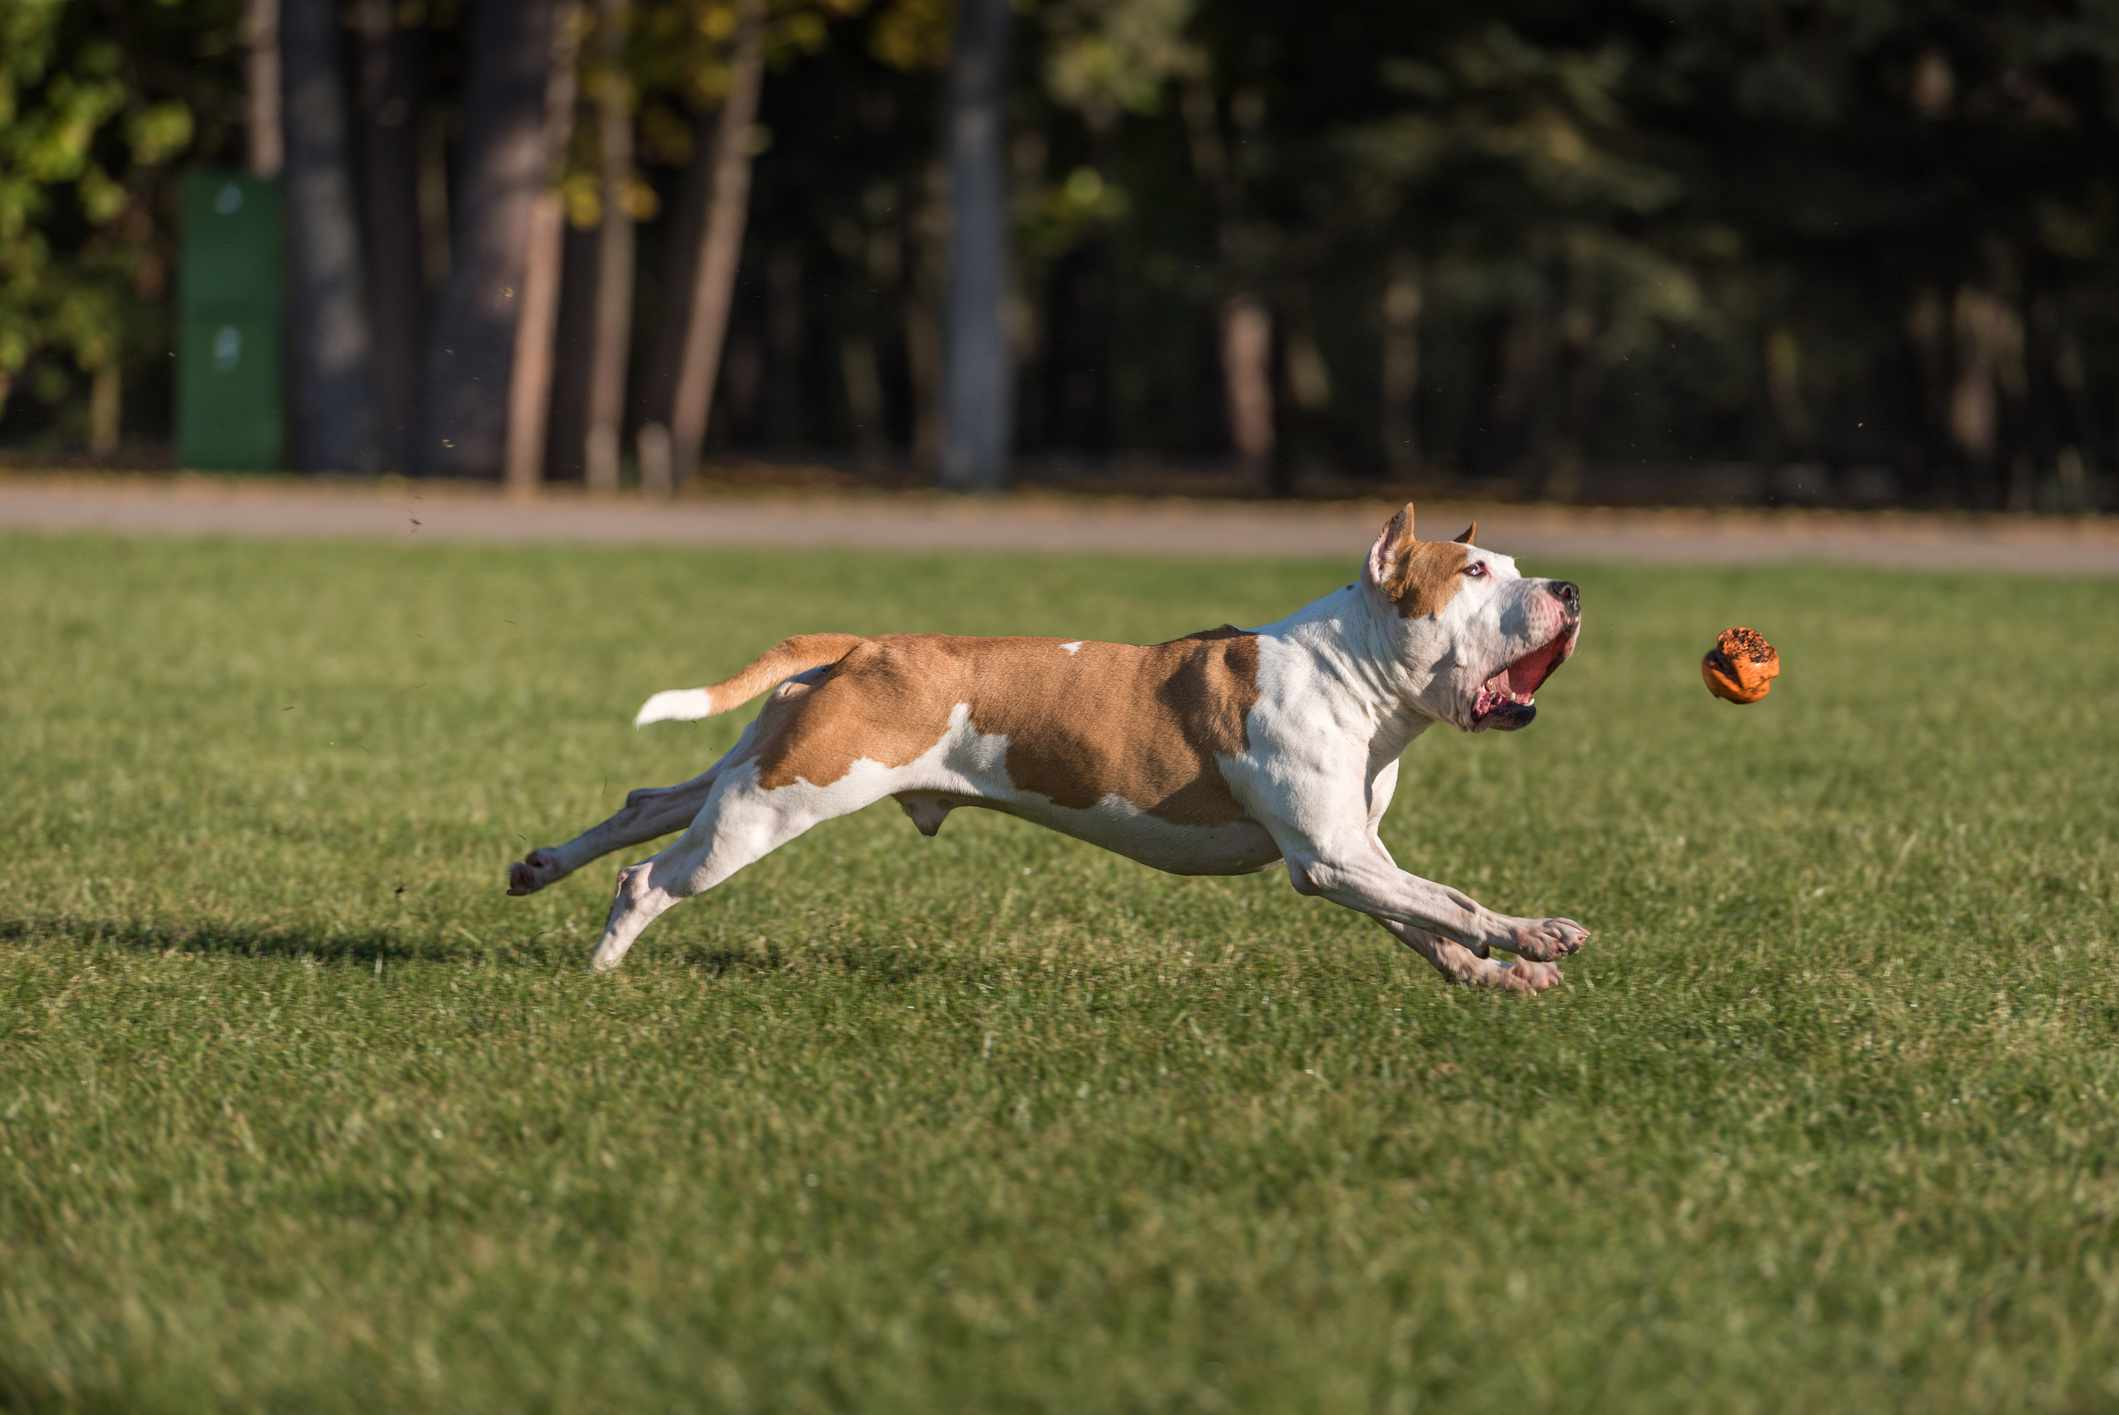 American bulldog running outside